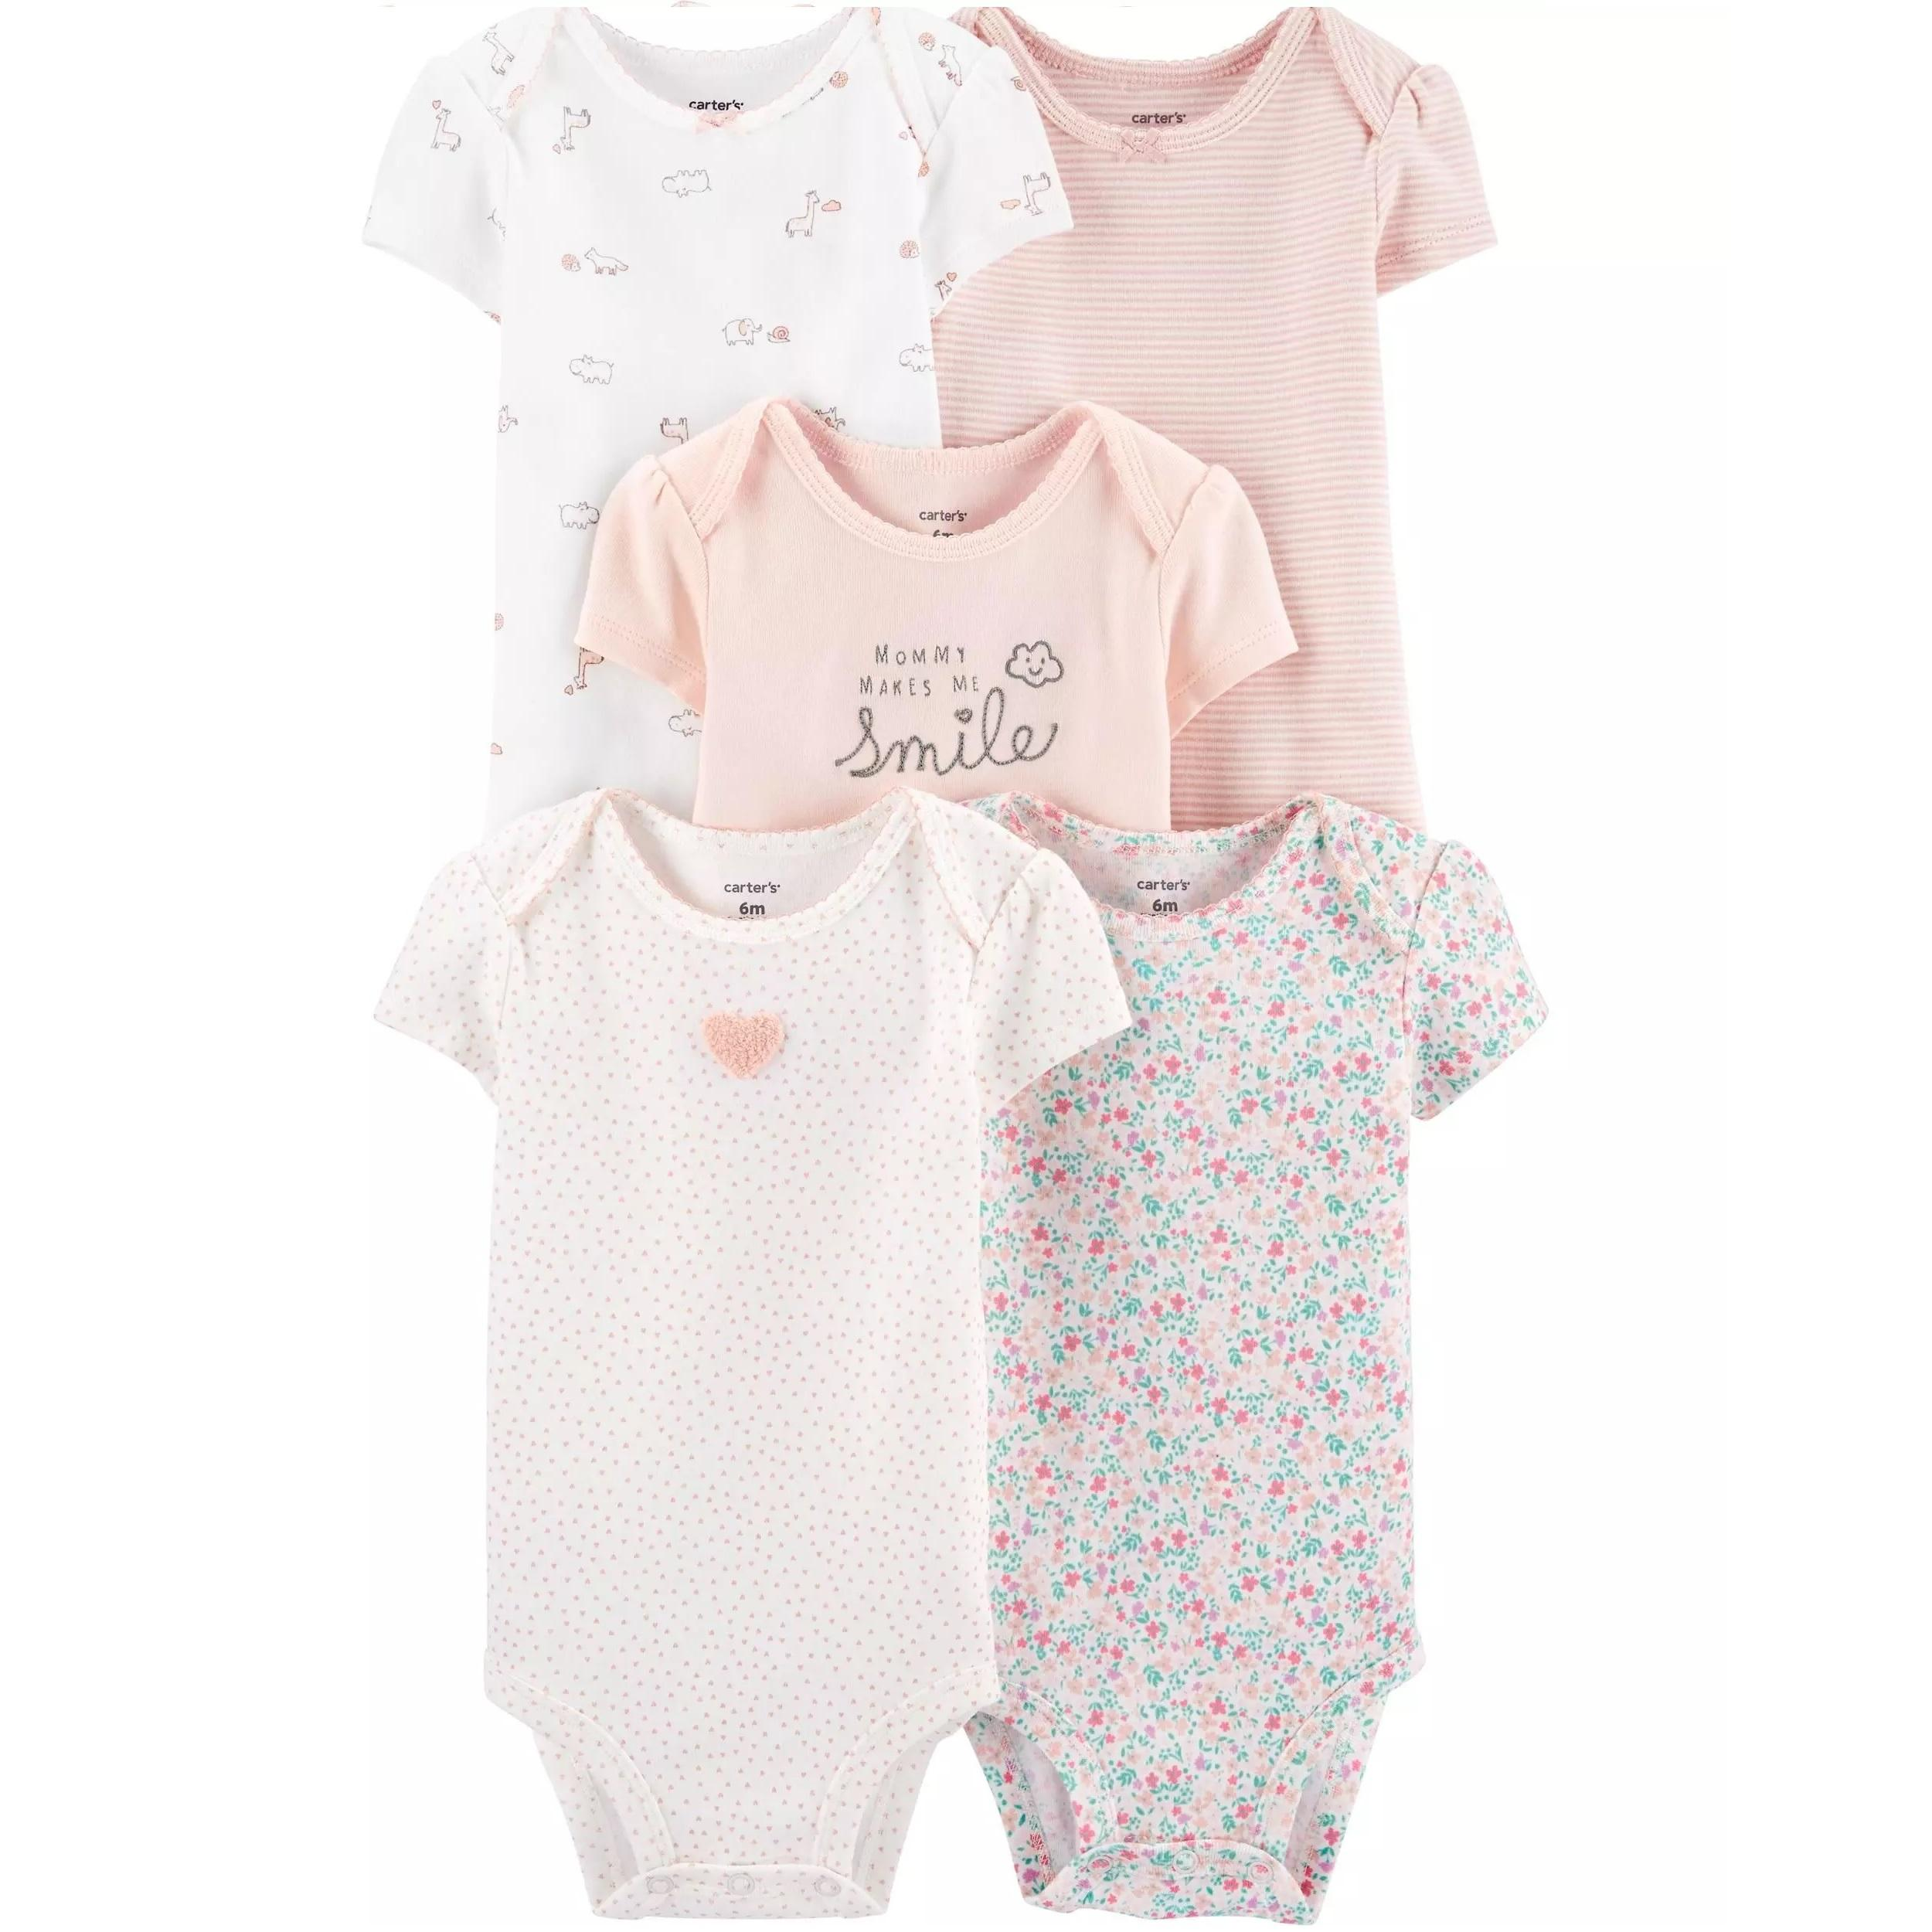 Cagl214 Carter S Baby Girls 5 Pack Floral Original Bodysuits